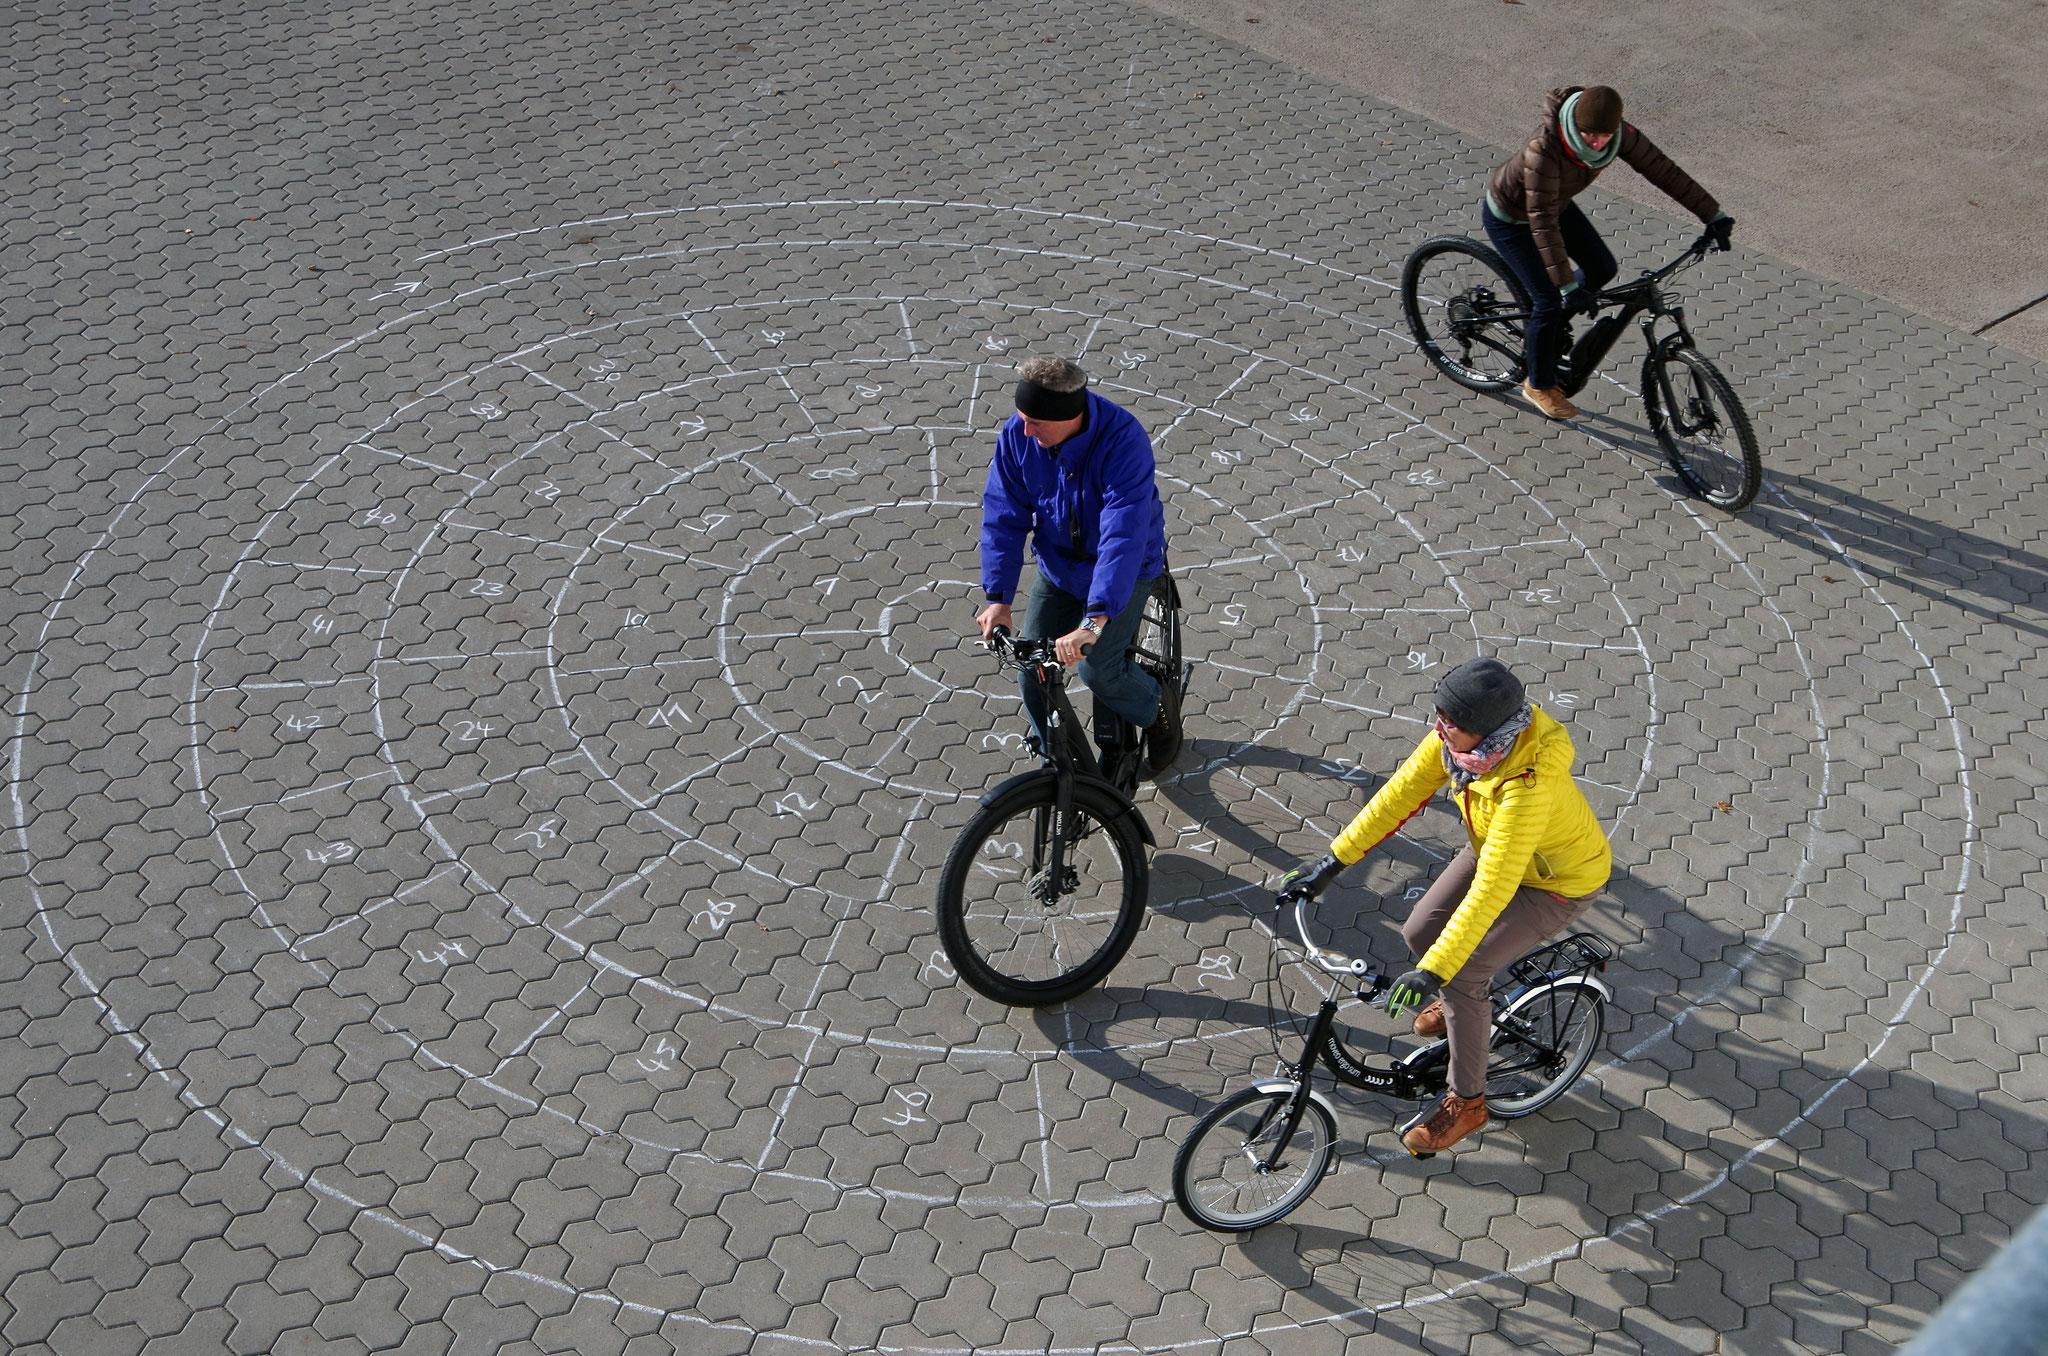 mit dem Pedelec im Kreisel - Foto Christian Burmeister